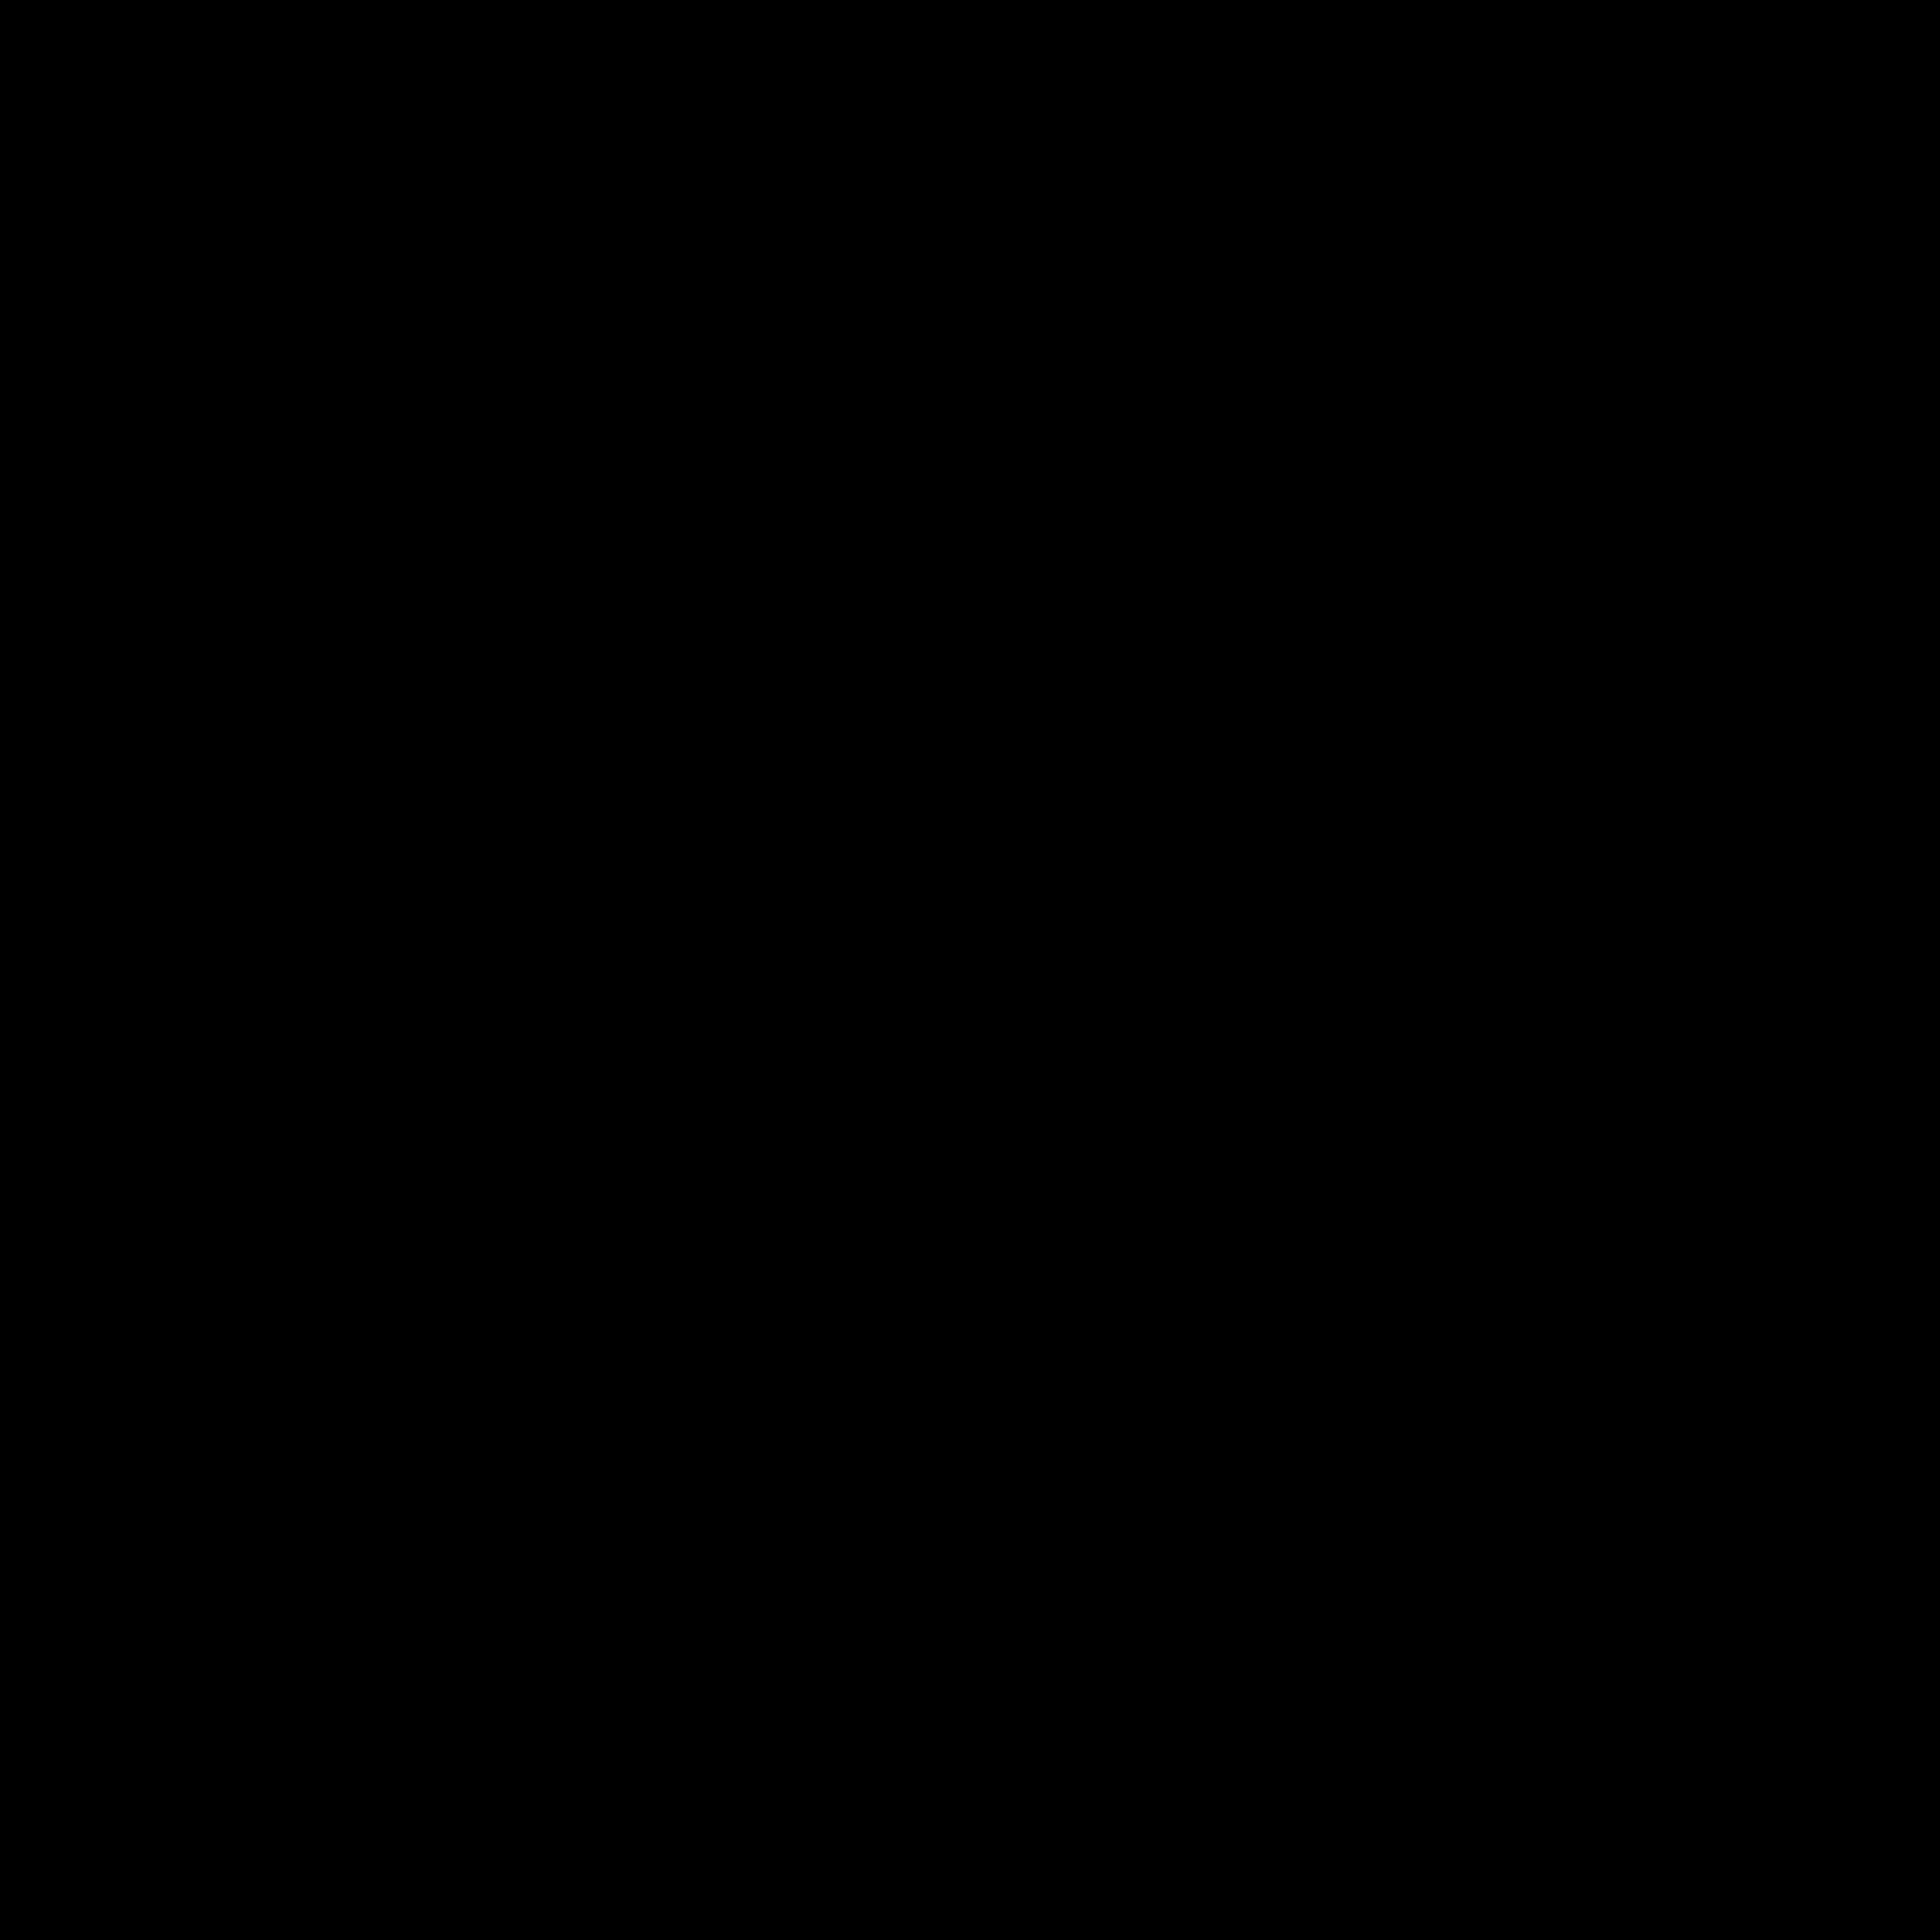 Acoustic guitar png black. Musician clipart transparent background mexican